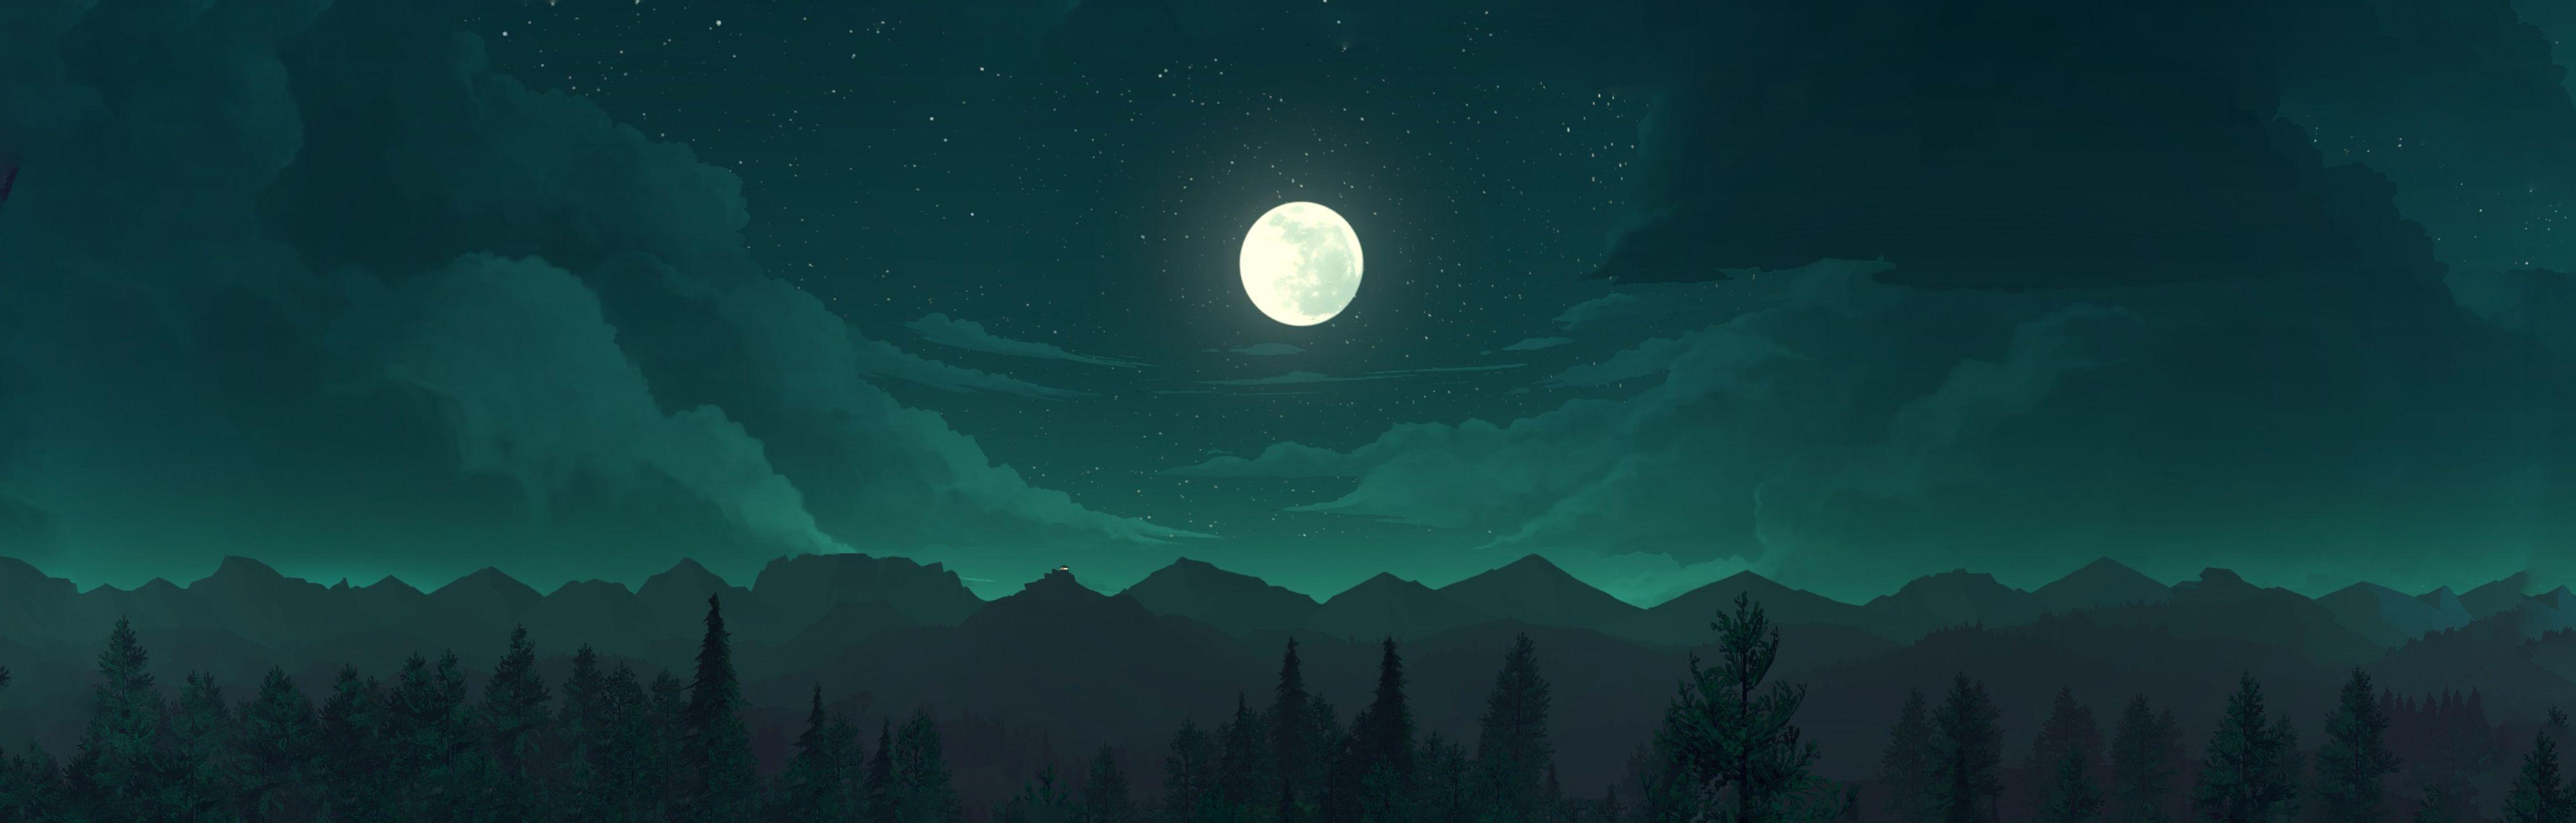 Video Game Firewatch Moon Wallpaper Ambiance, Écran